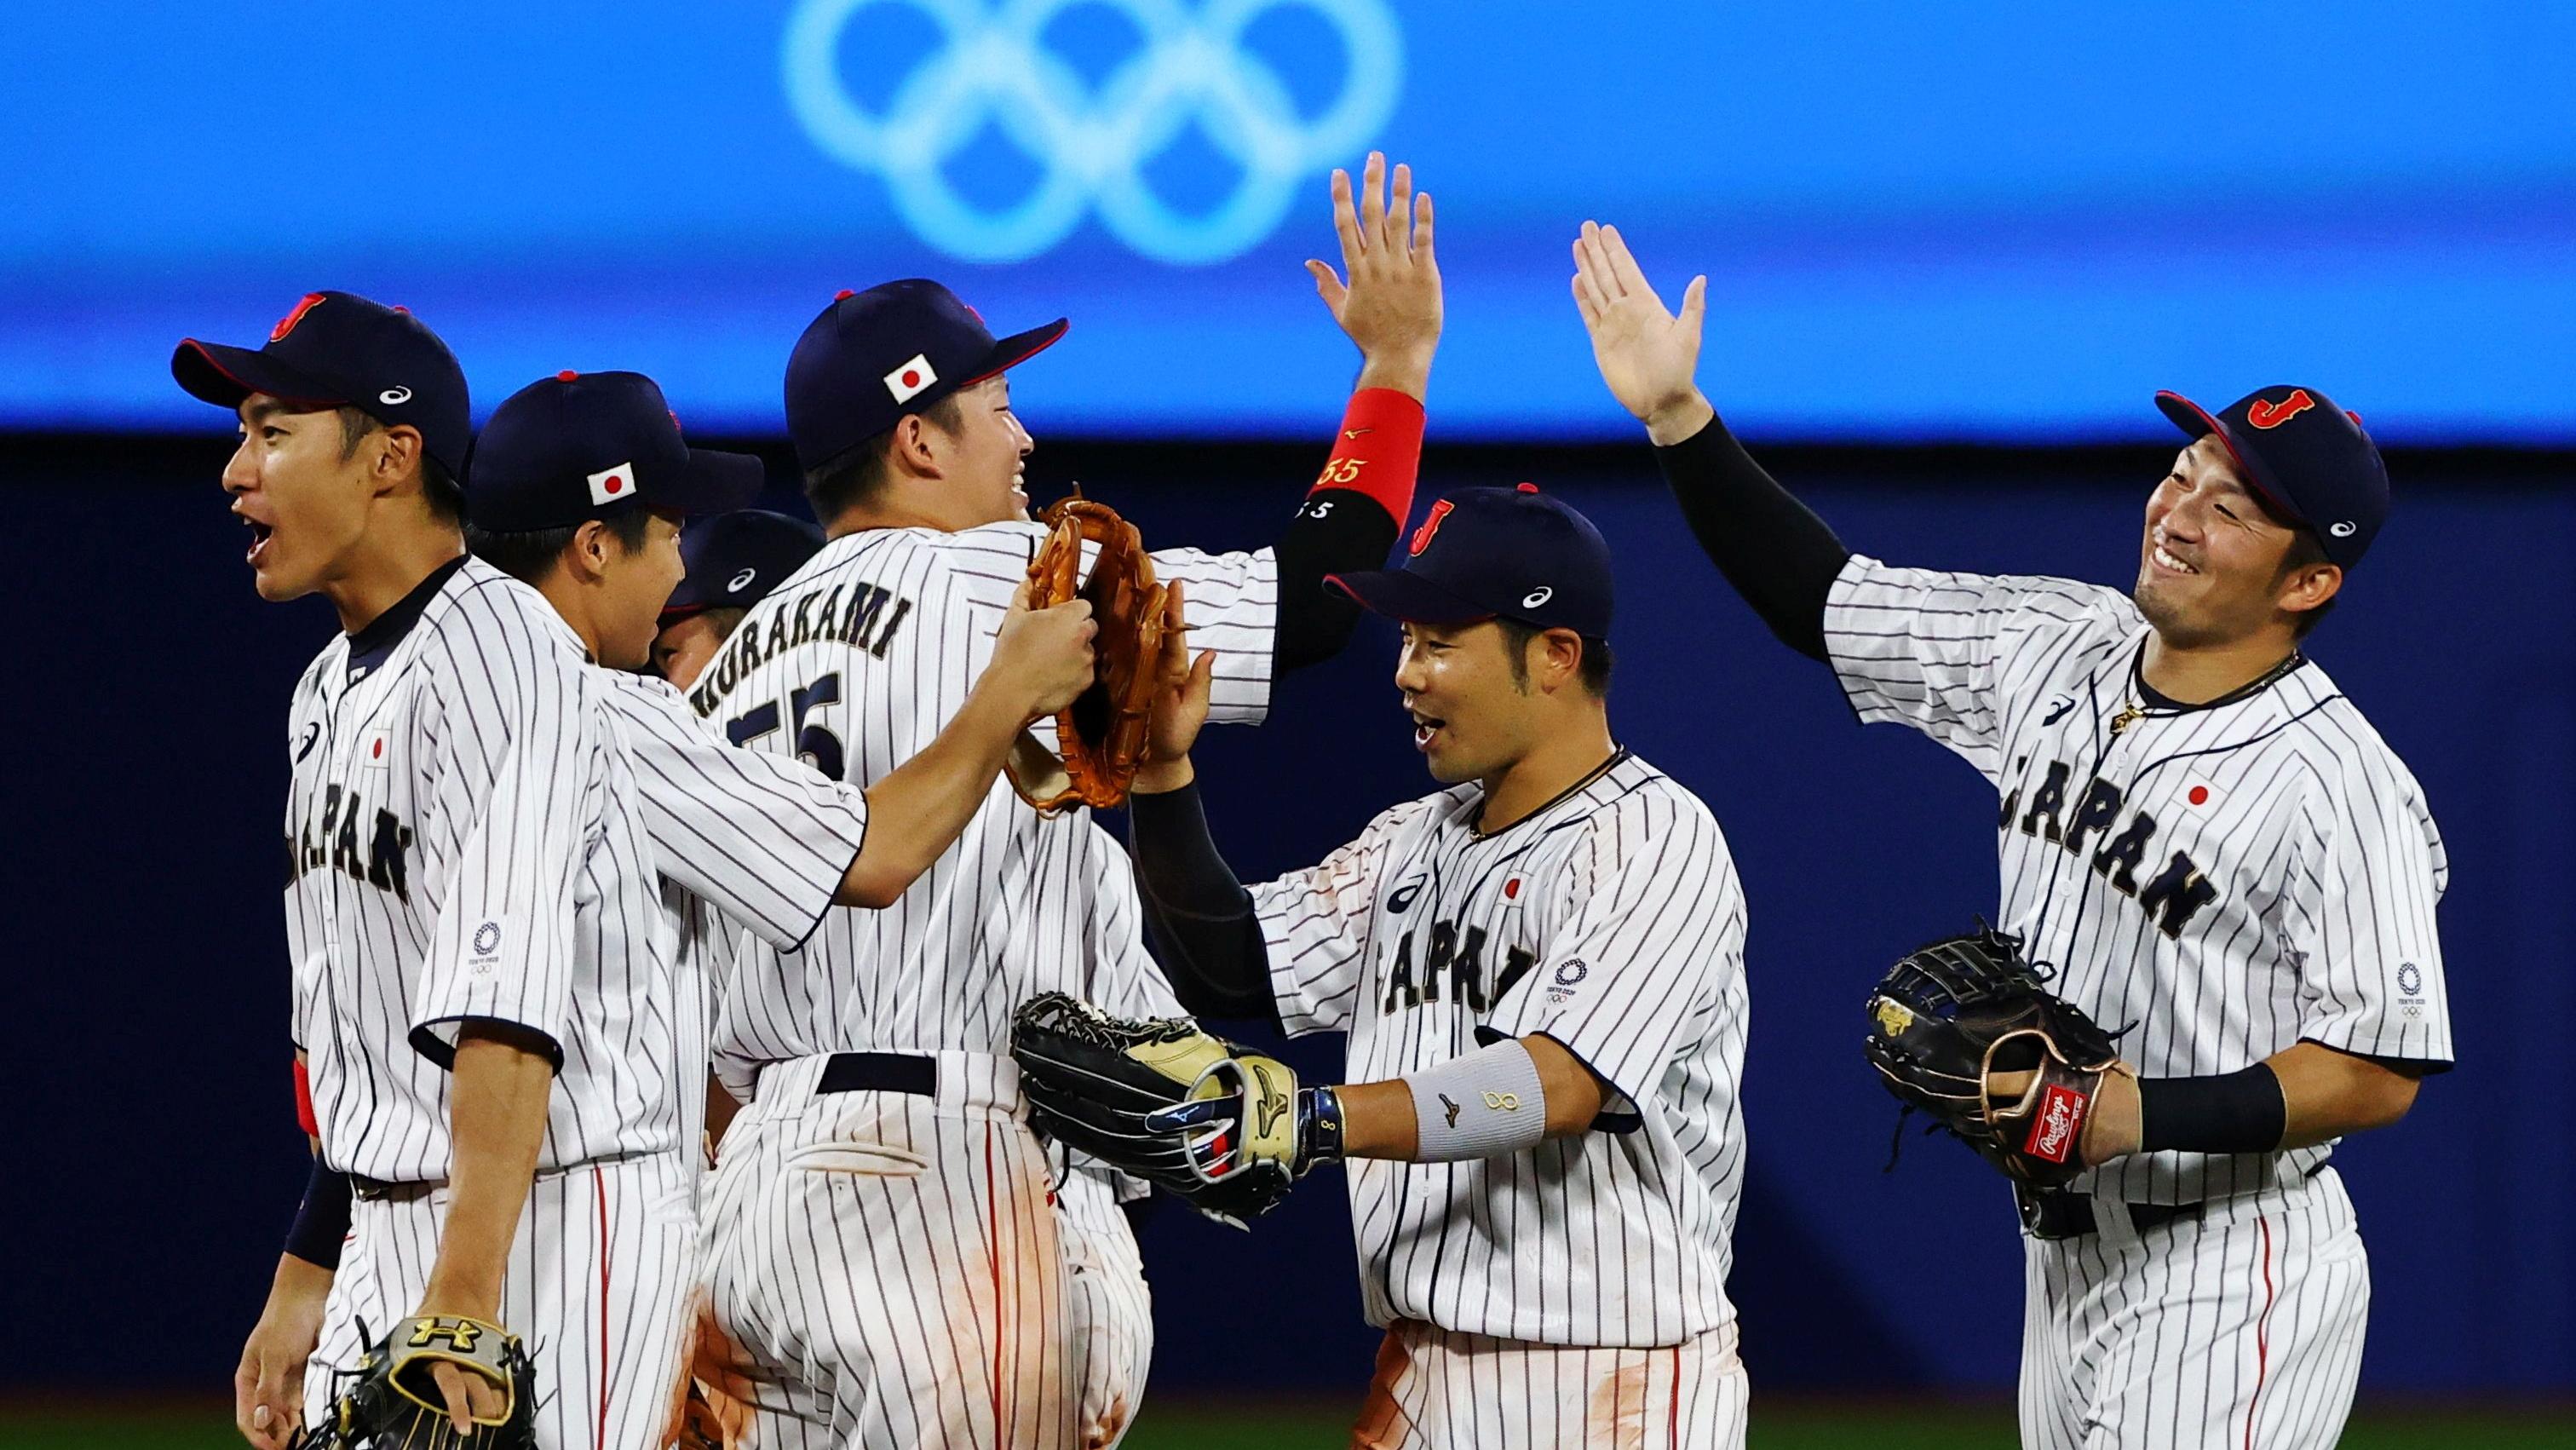 Tokyo 2020 Olympics - Baseball - Men - Semifinal - South Korea v Japan - Yokohama Baseball Stadium, Yokohama, Japan - August 4, 2021. Japan players celebrate winning the game. REUTERS/Jorge Silva